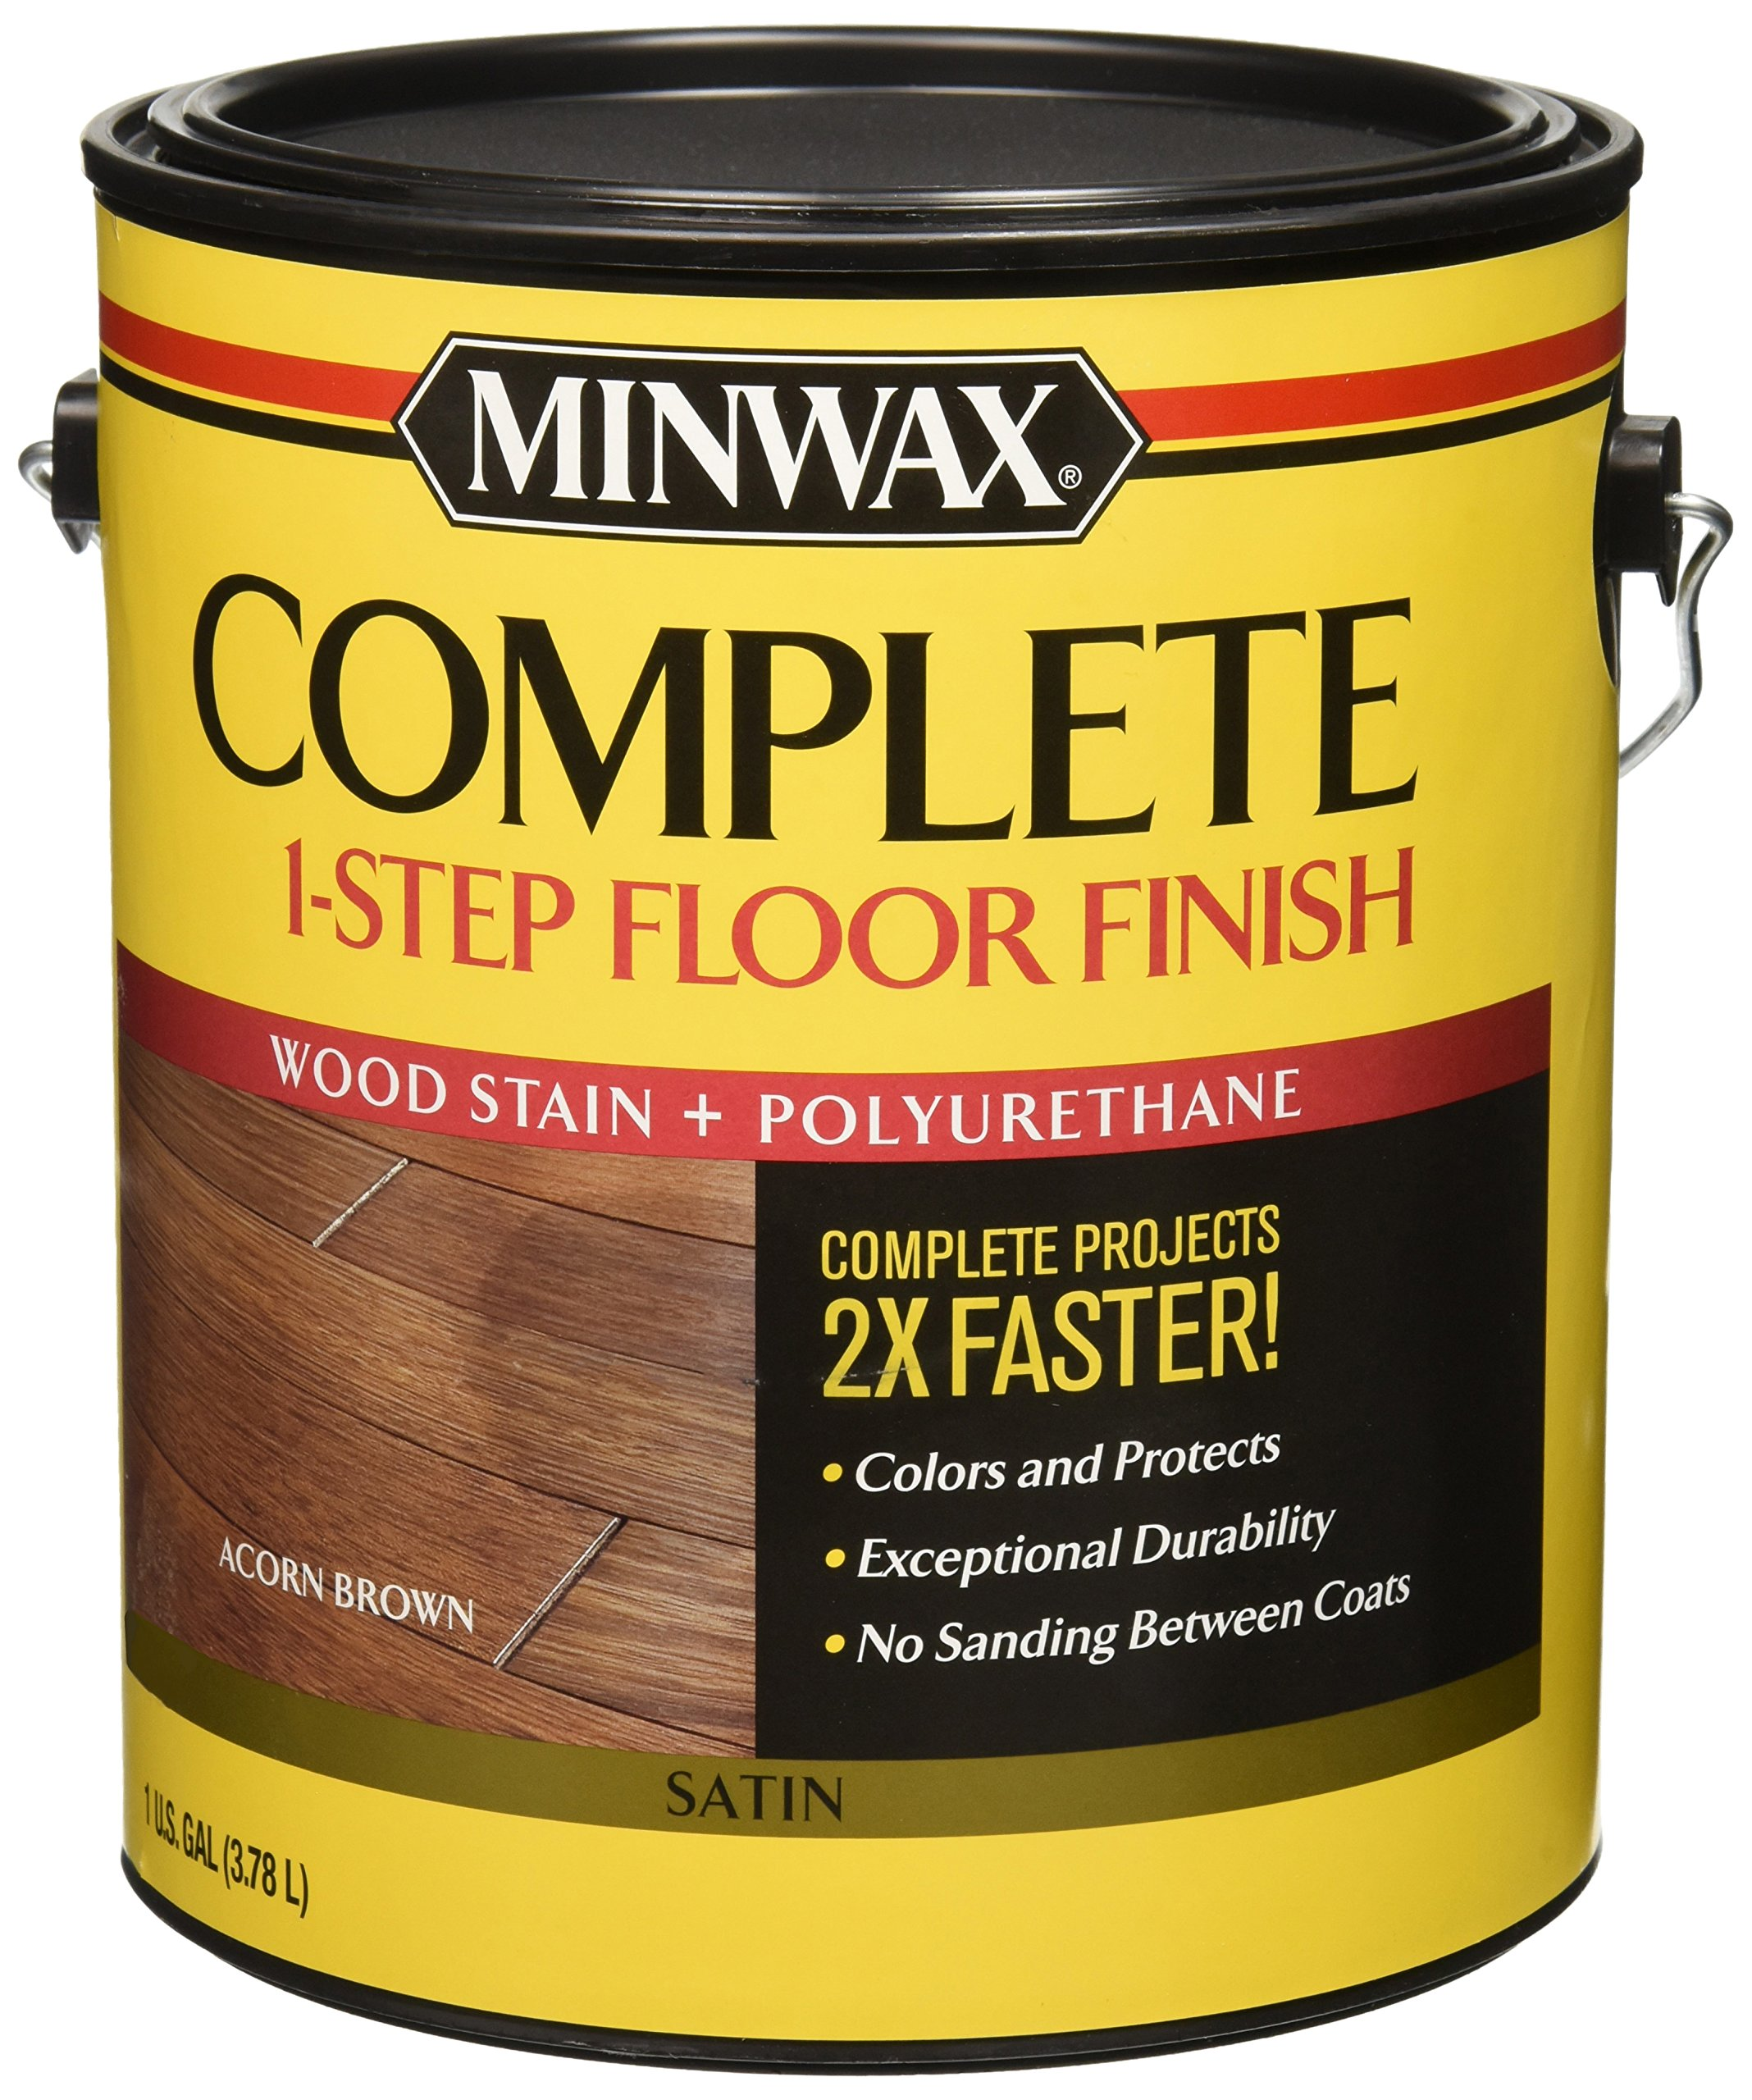 Minwax 672030000 1G Satin Acorn Brown Complete 1-Step Floor Finish